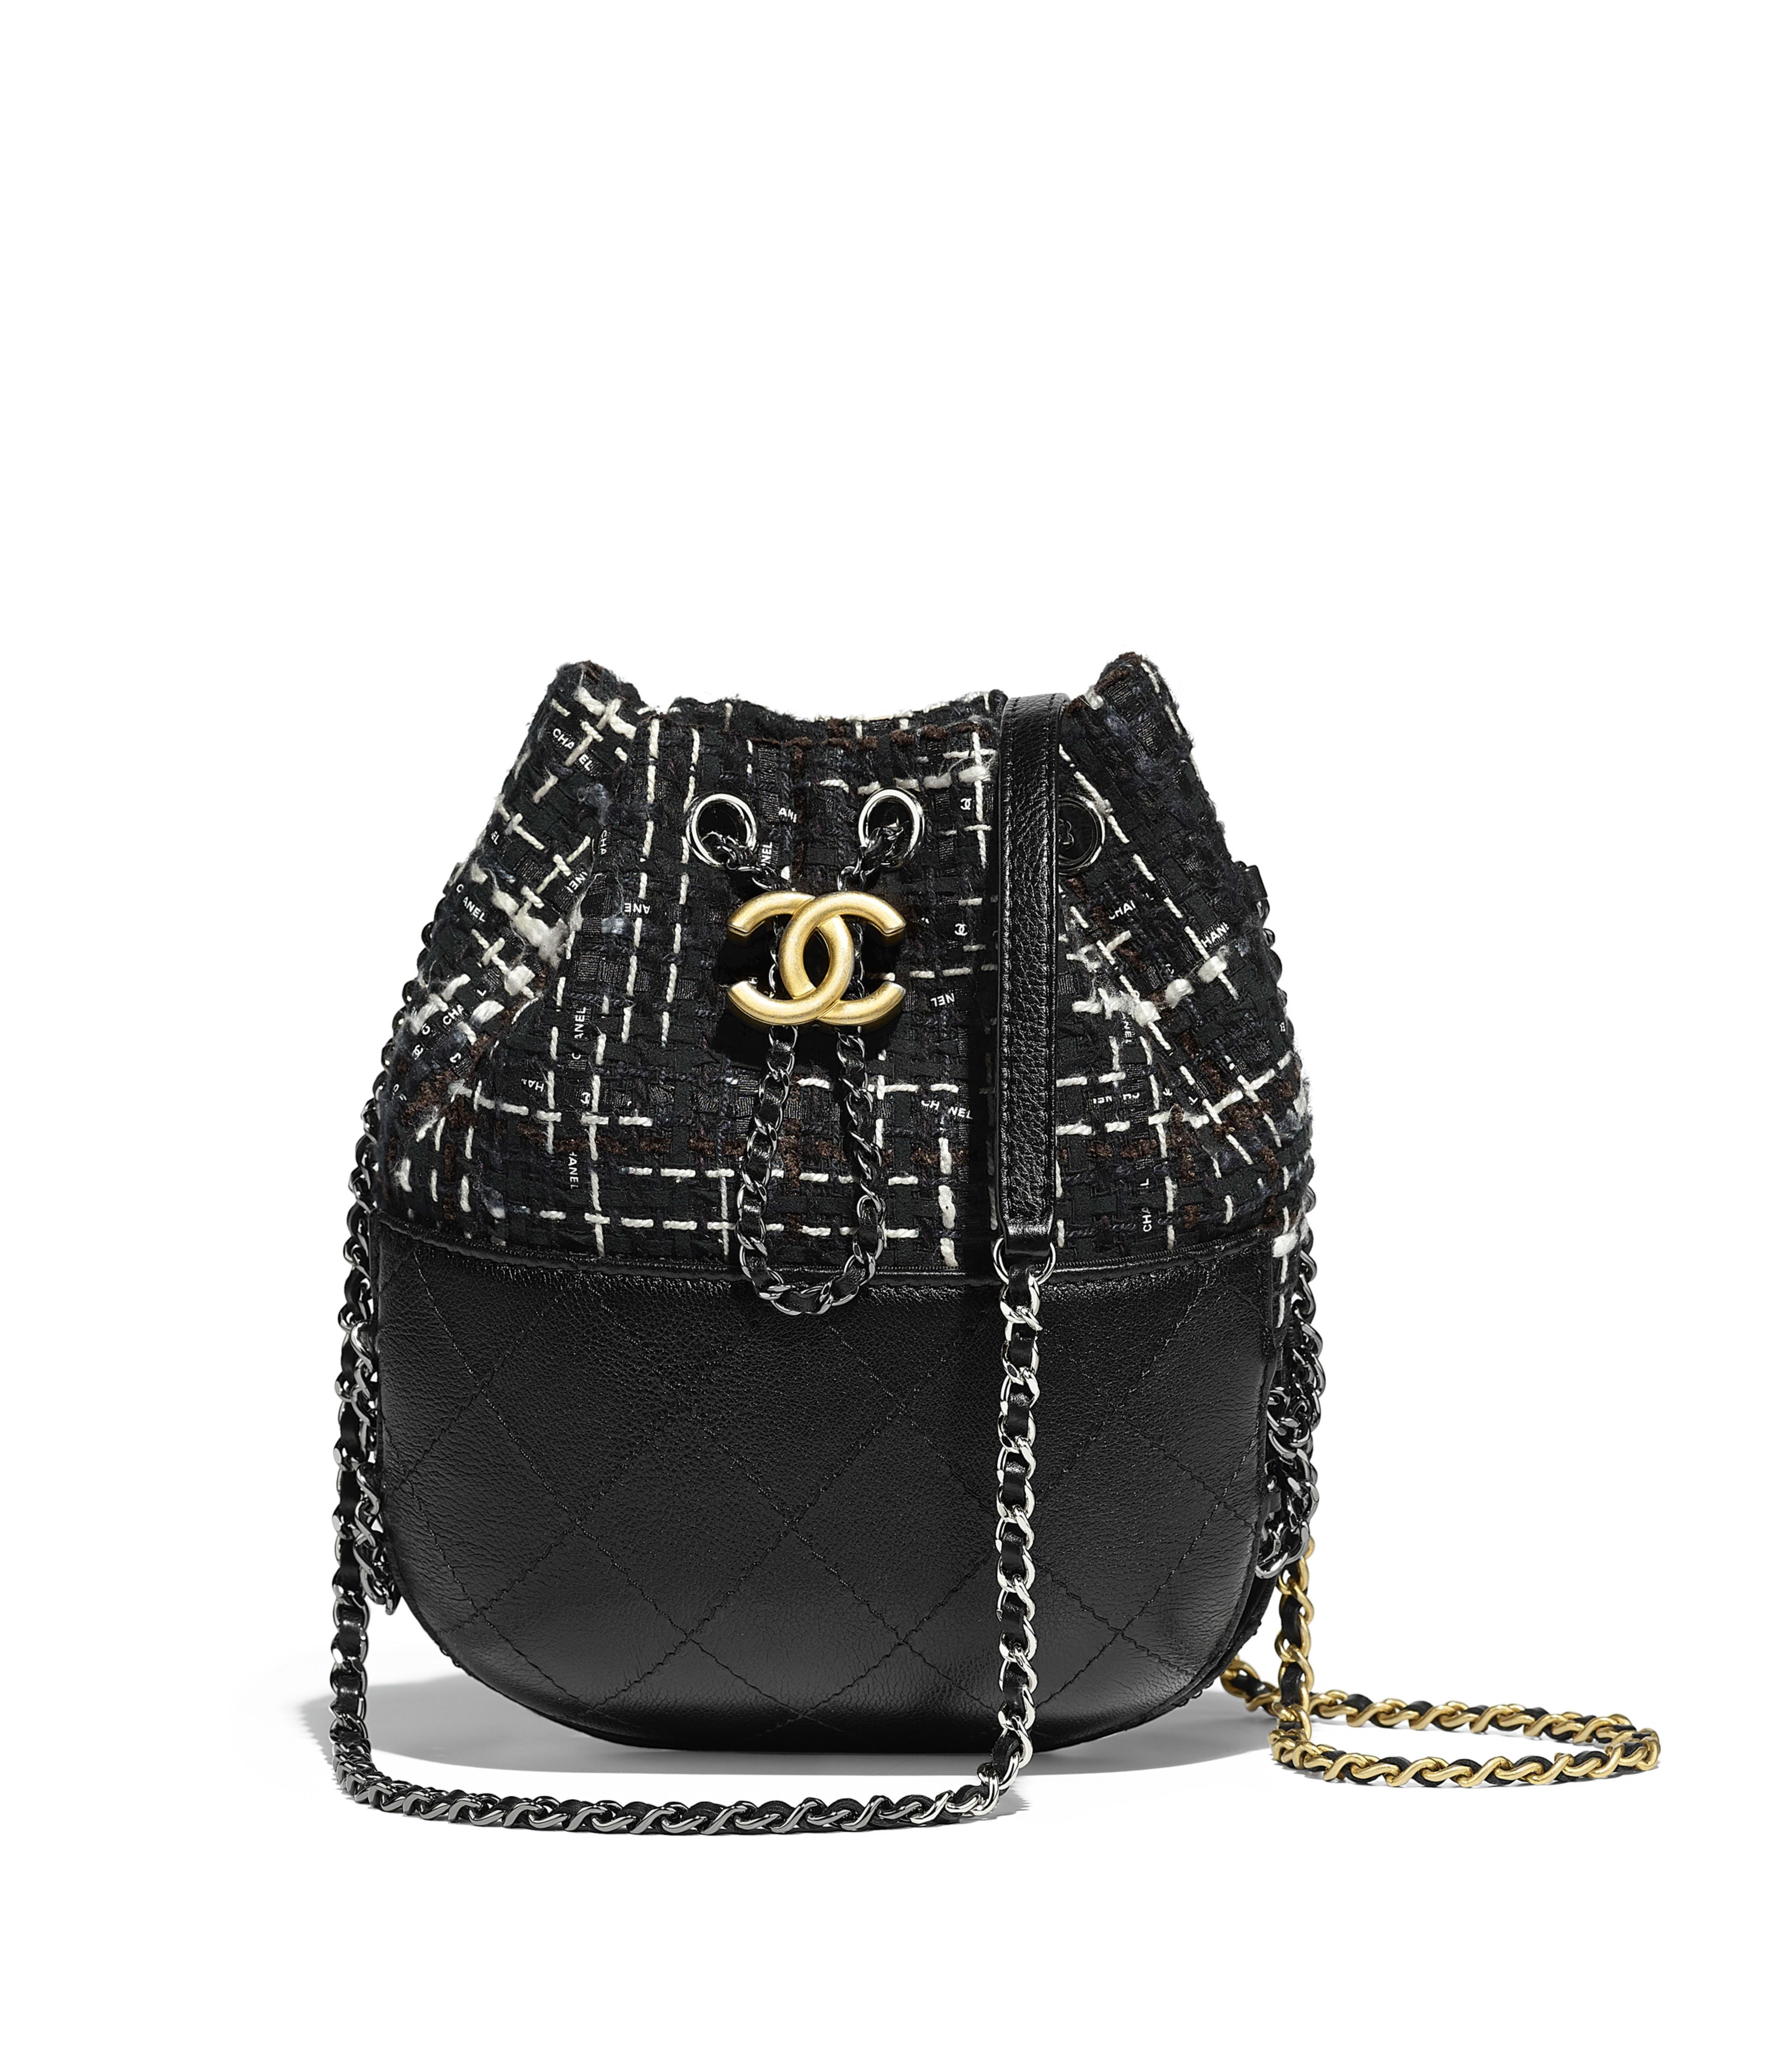 Chanel S Gabrielle Purse Tweed Calfskin Silver Tone Gold Metal Black Navy Brown Ecru Ref A98787y83876k0991